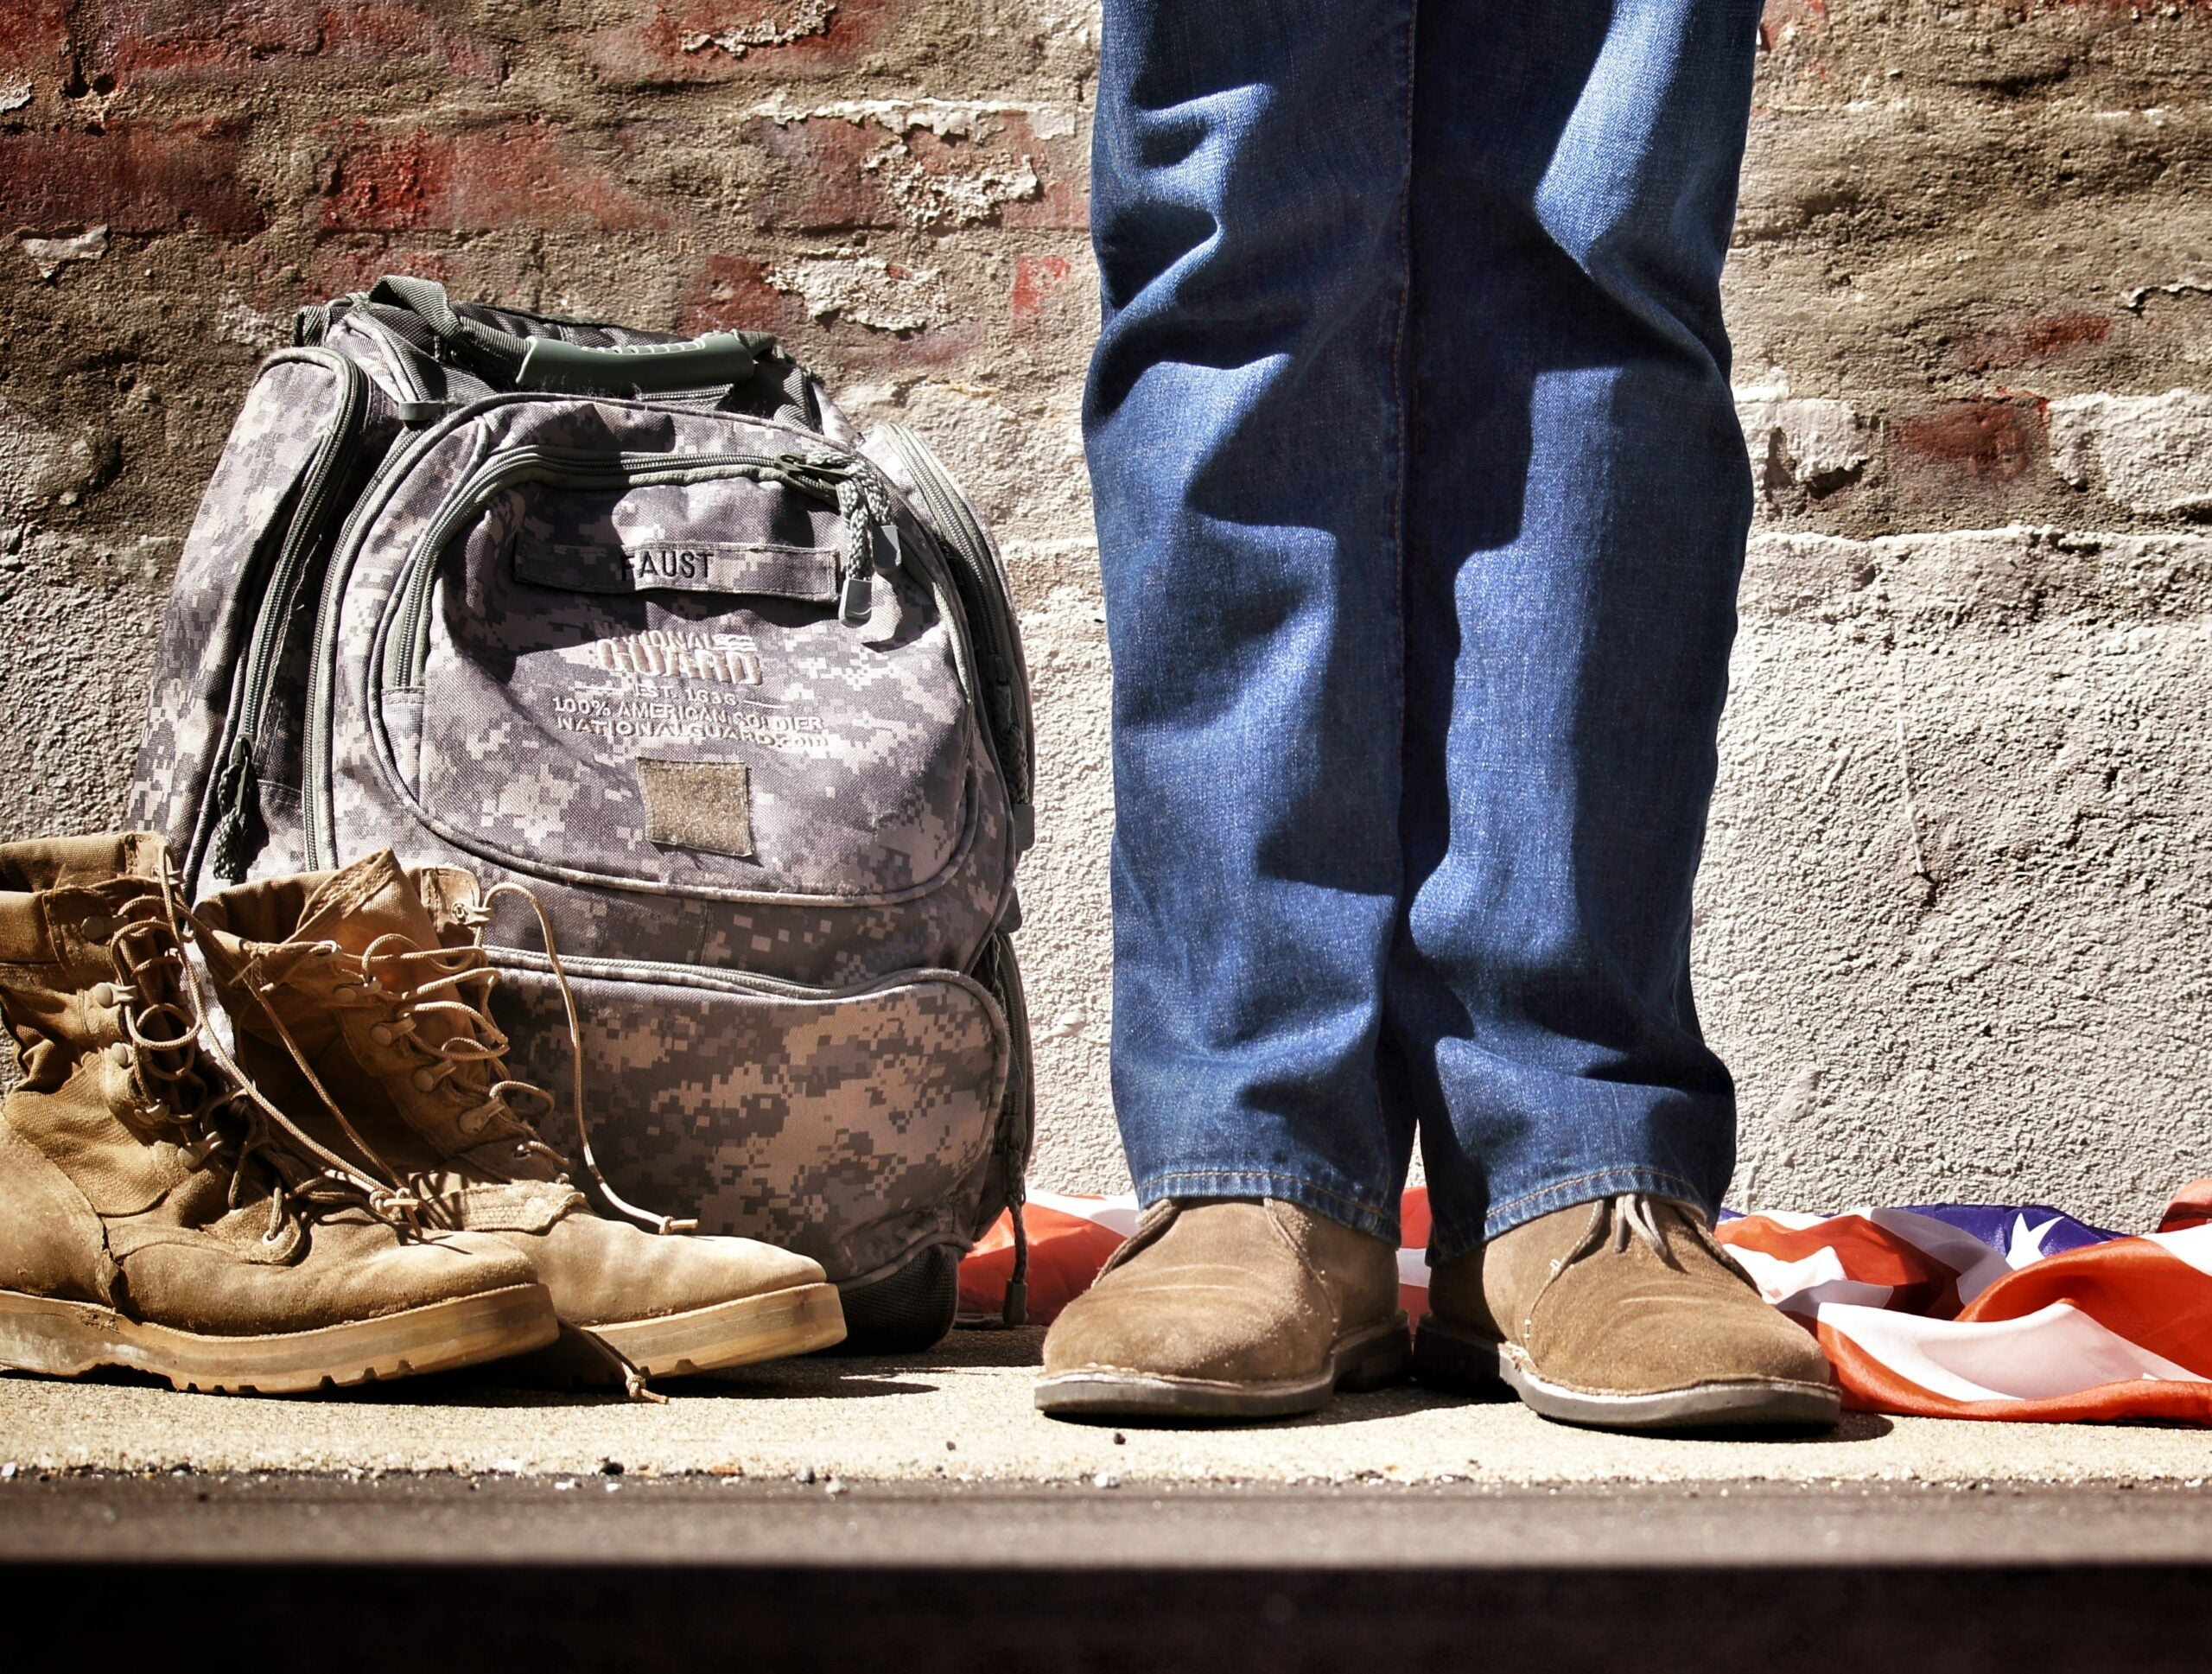 veteran returning to civilian life